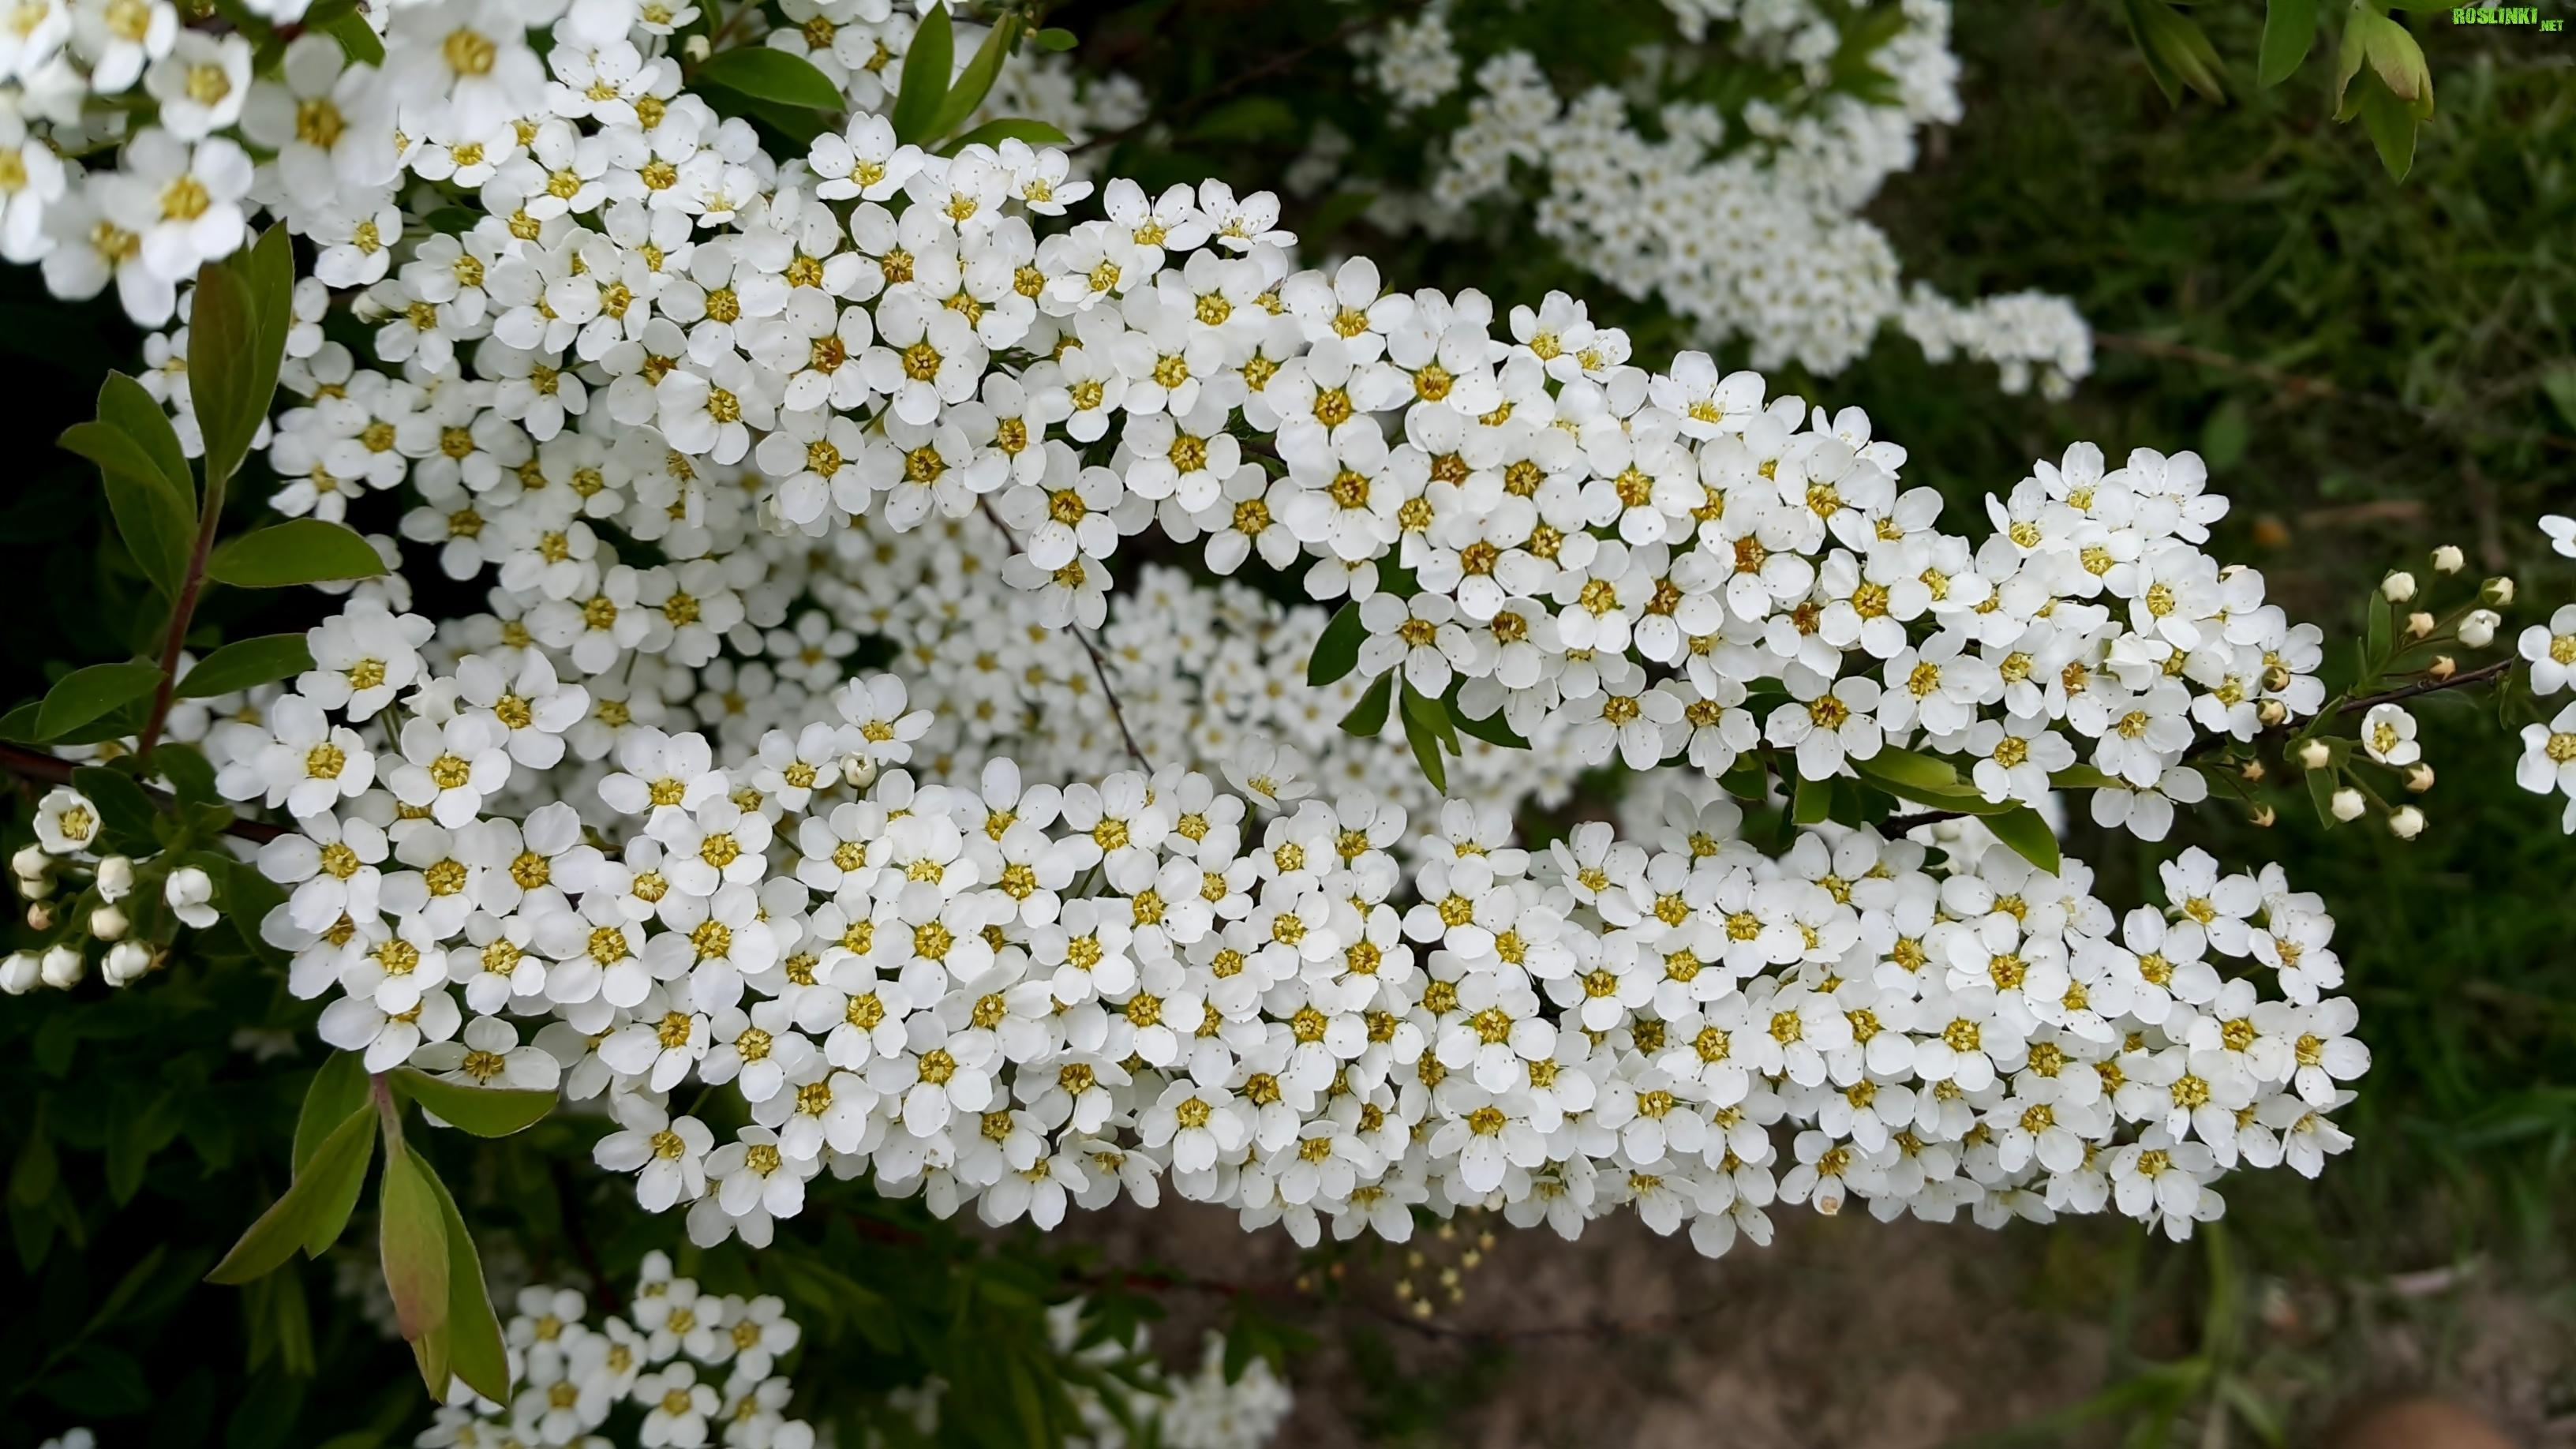 Galazki Krzewu Biale Kwiaty Tawula Japonska